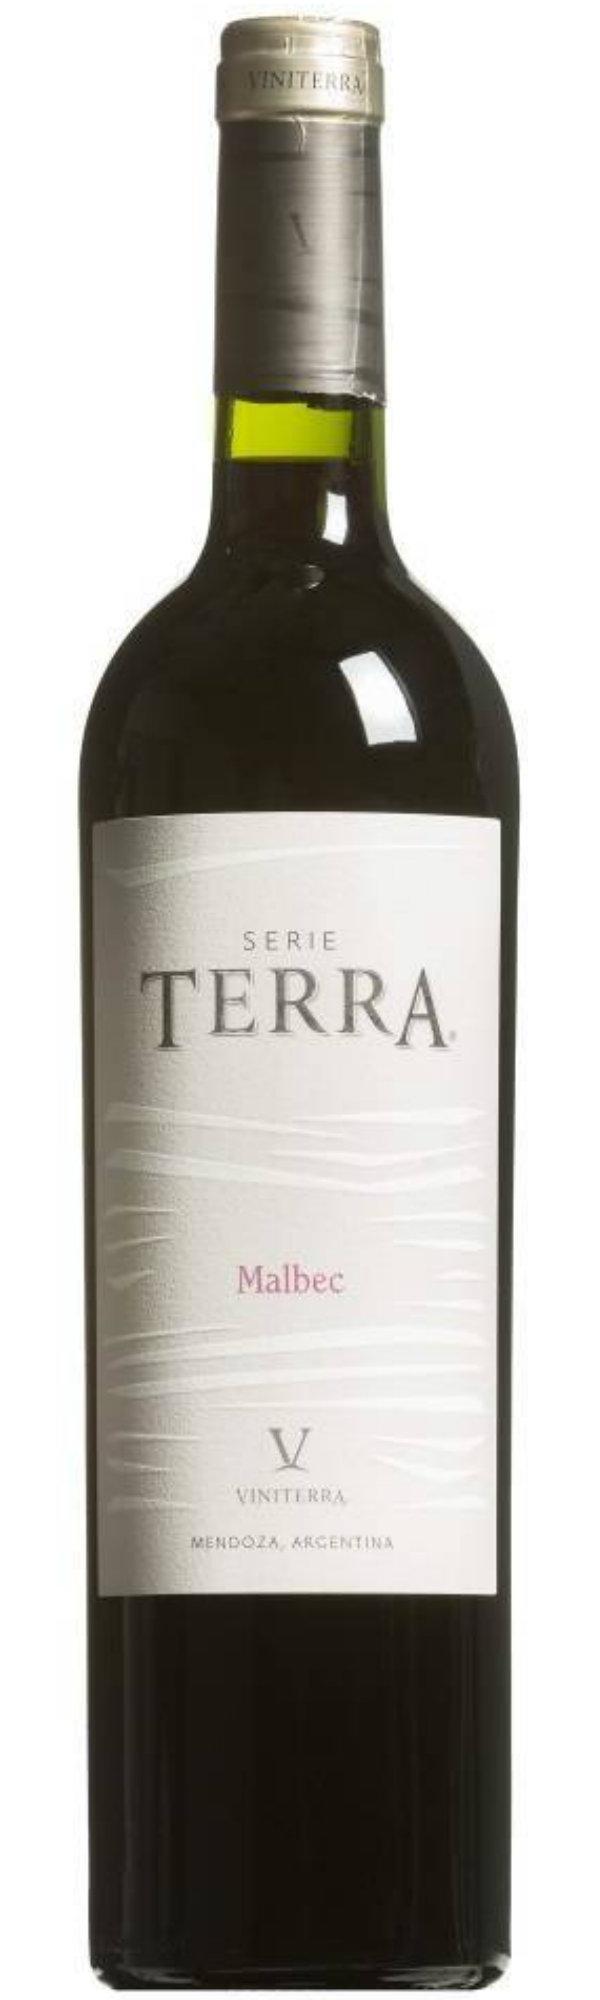 Viniterra SerieTerra Malbec